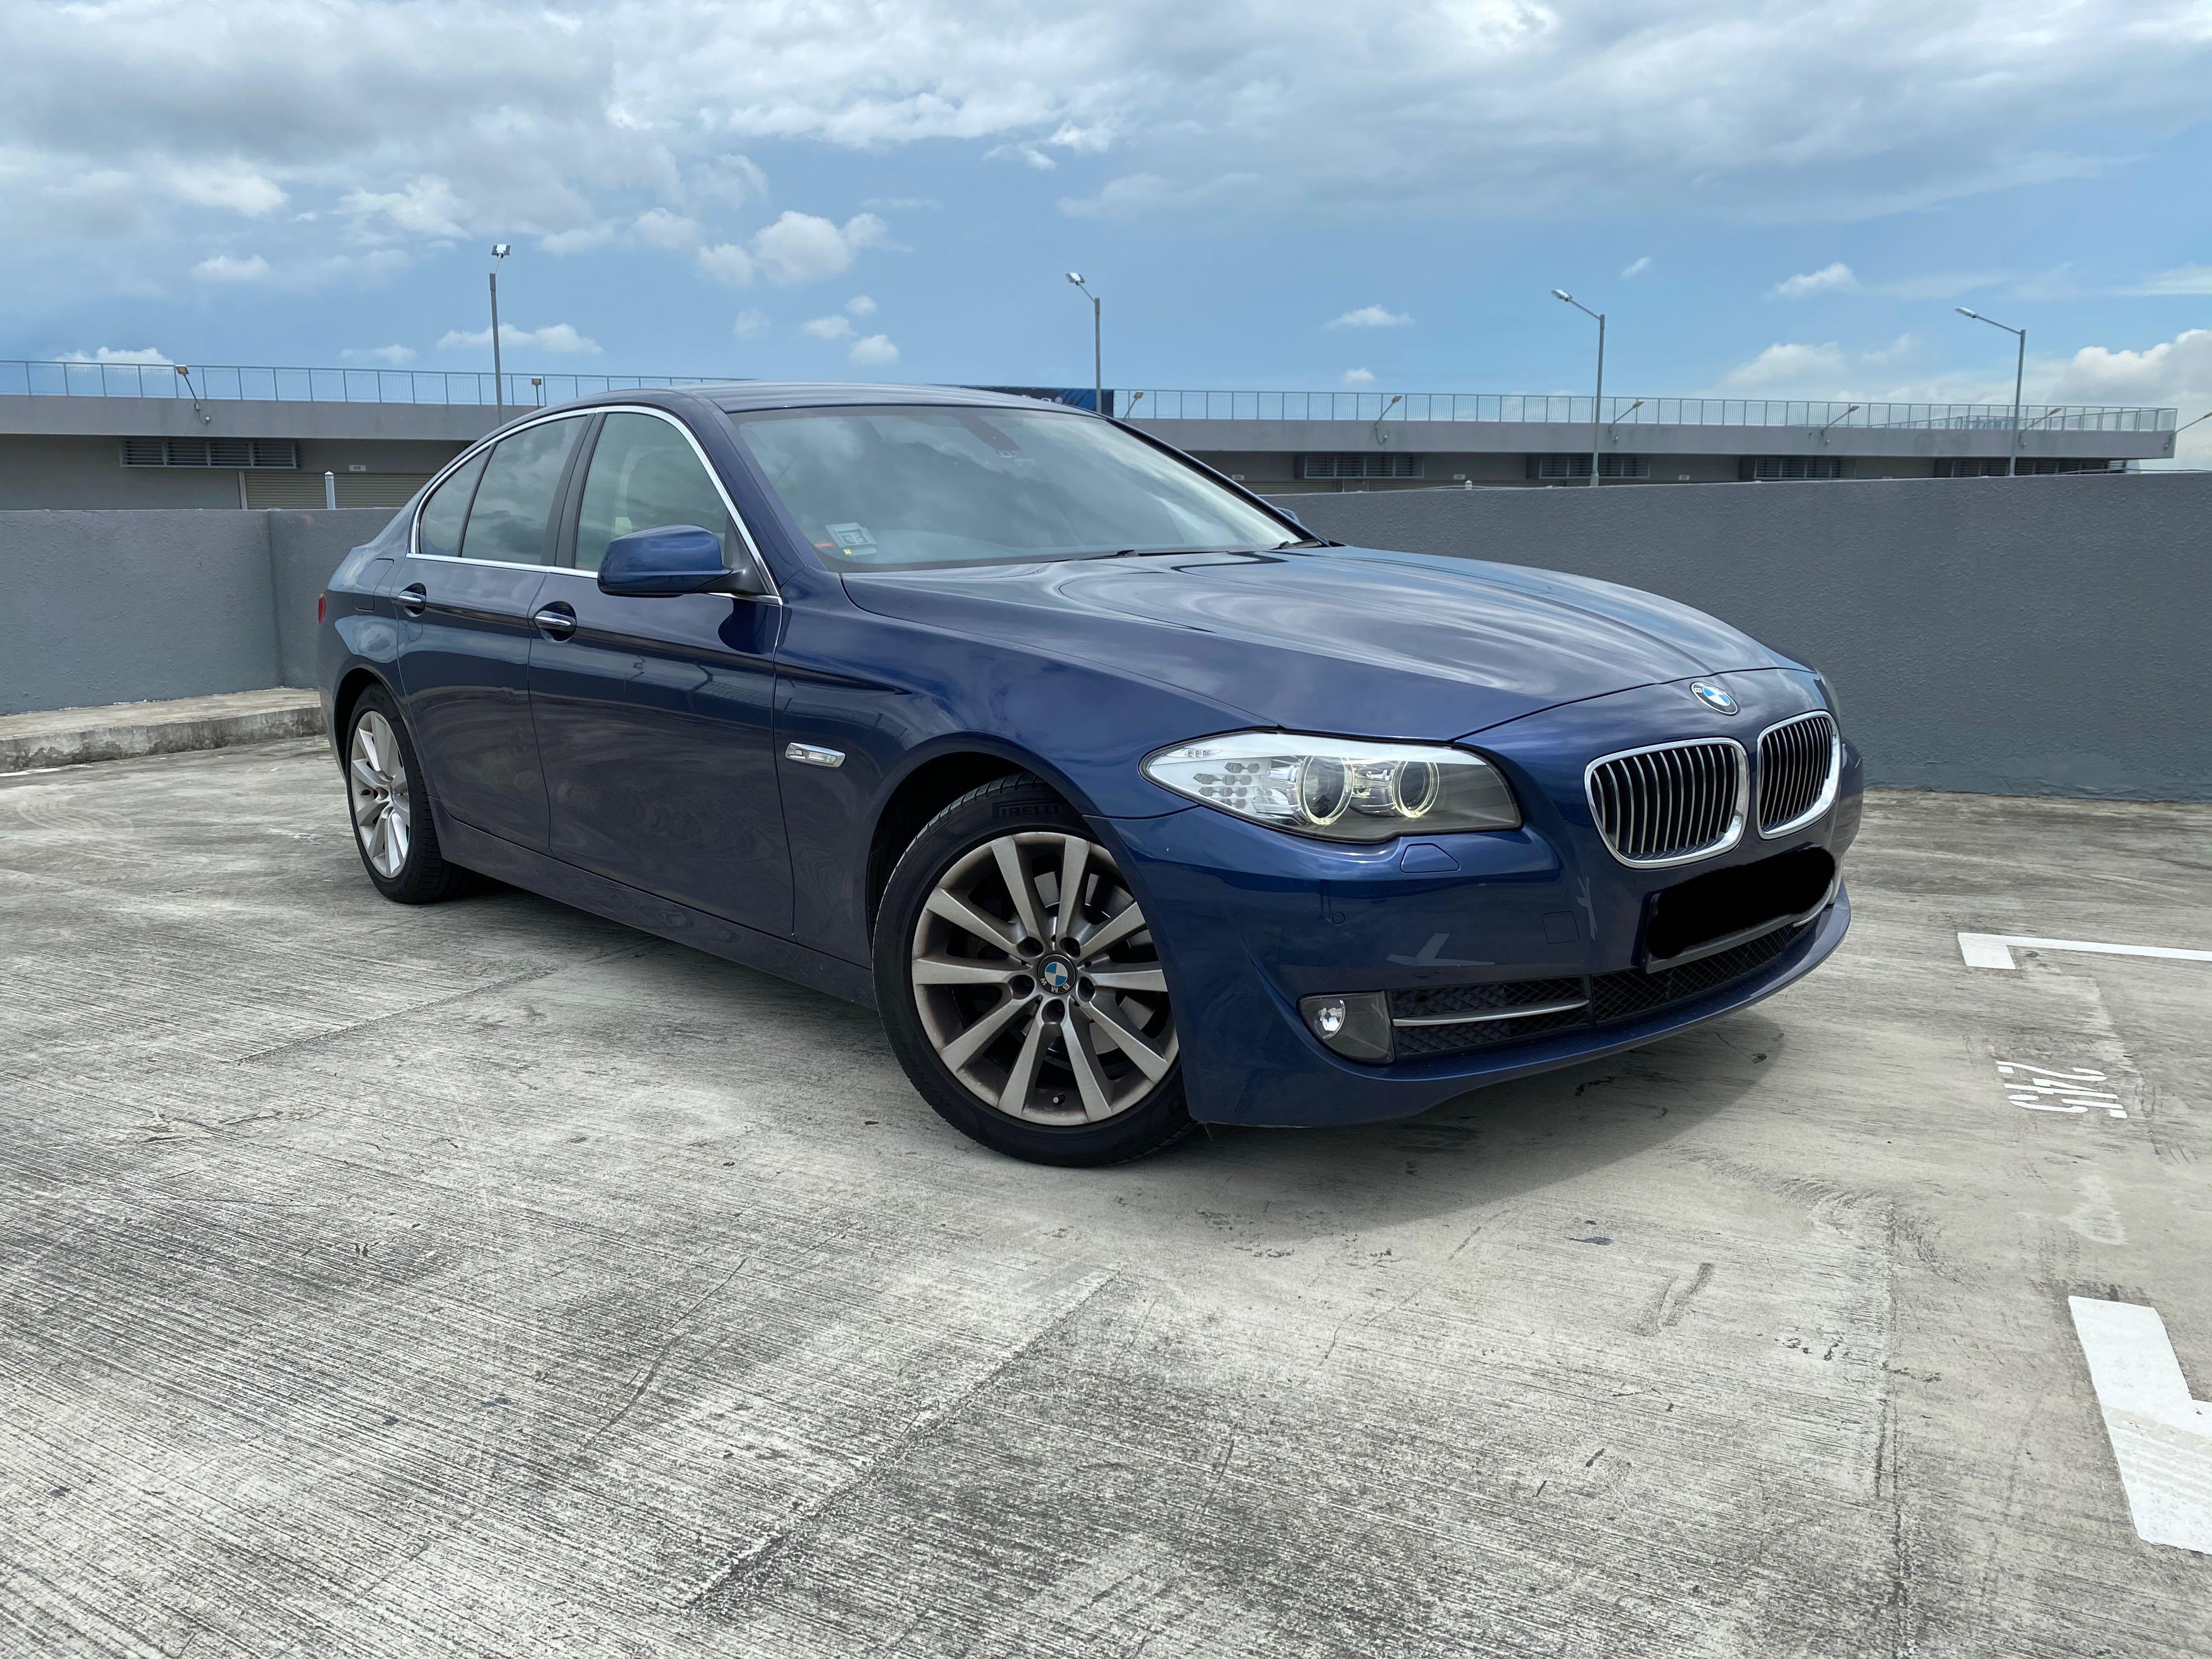 BMW 523i 2.5 F10 5 series !! Promo good price